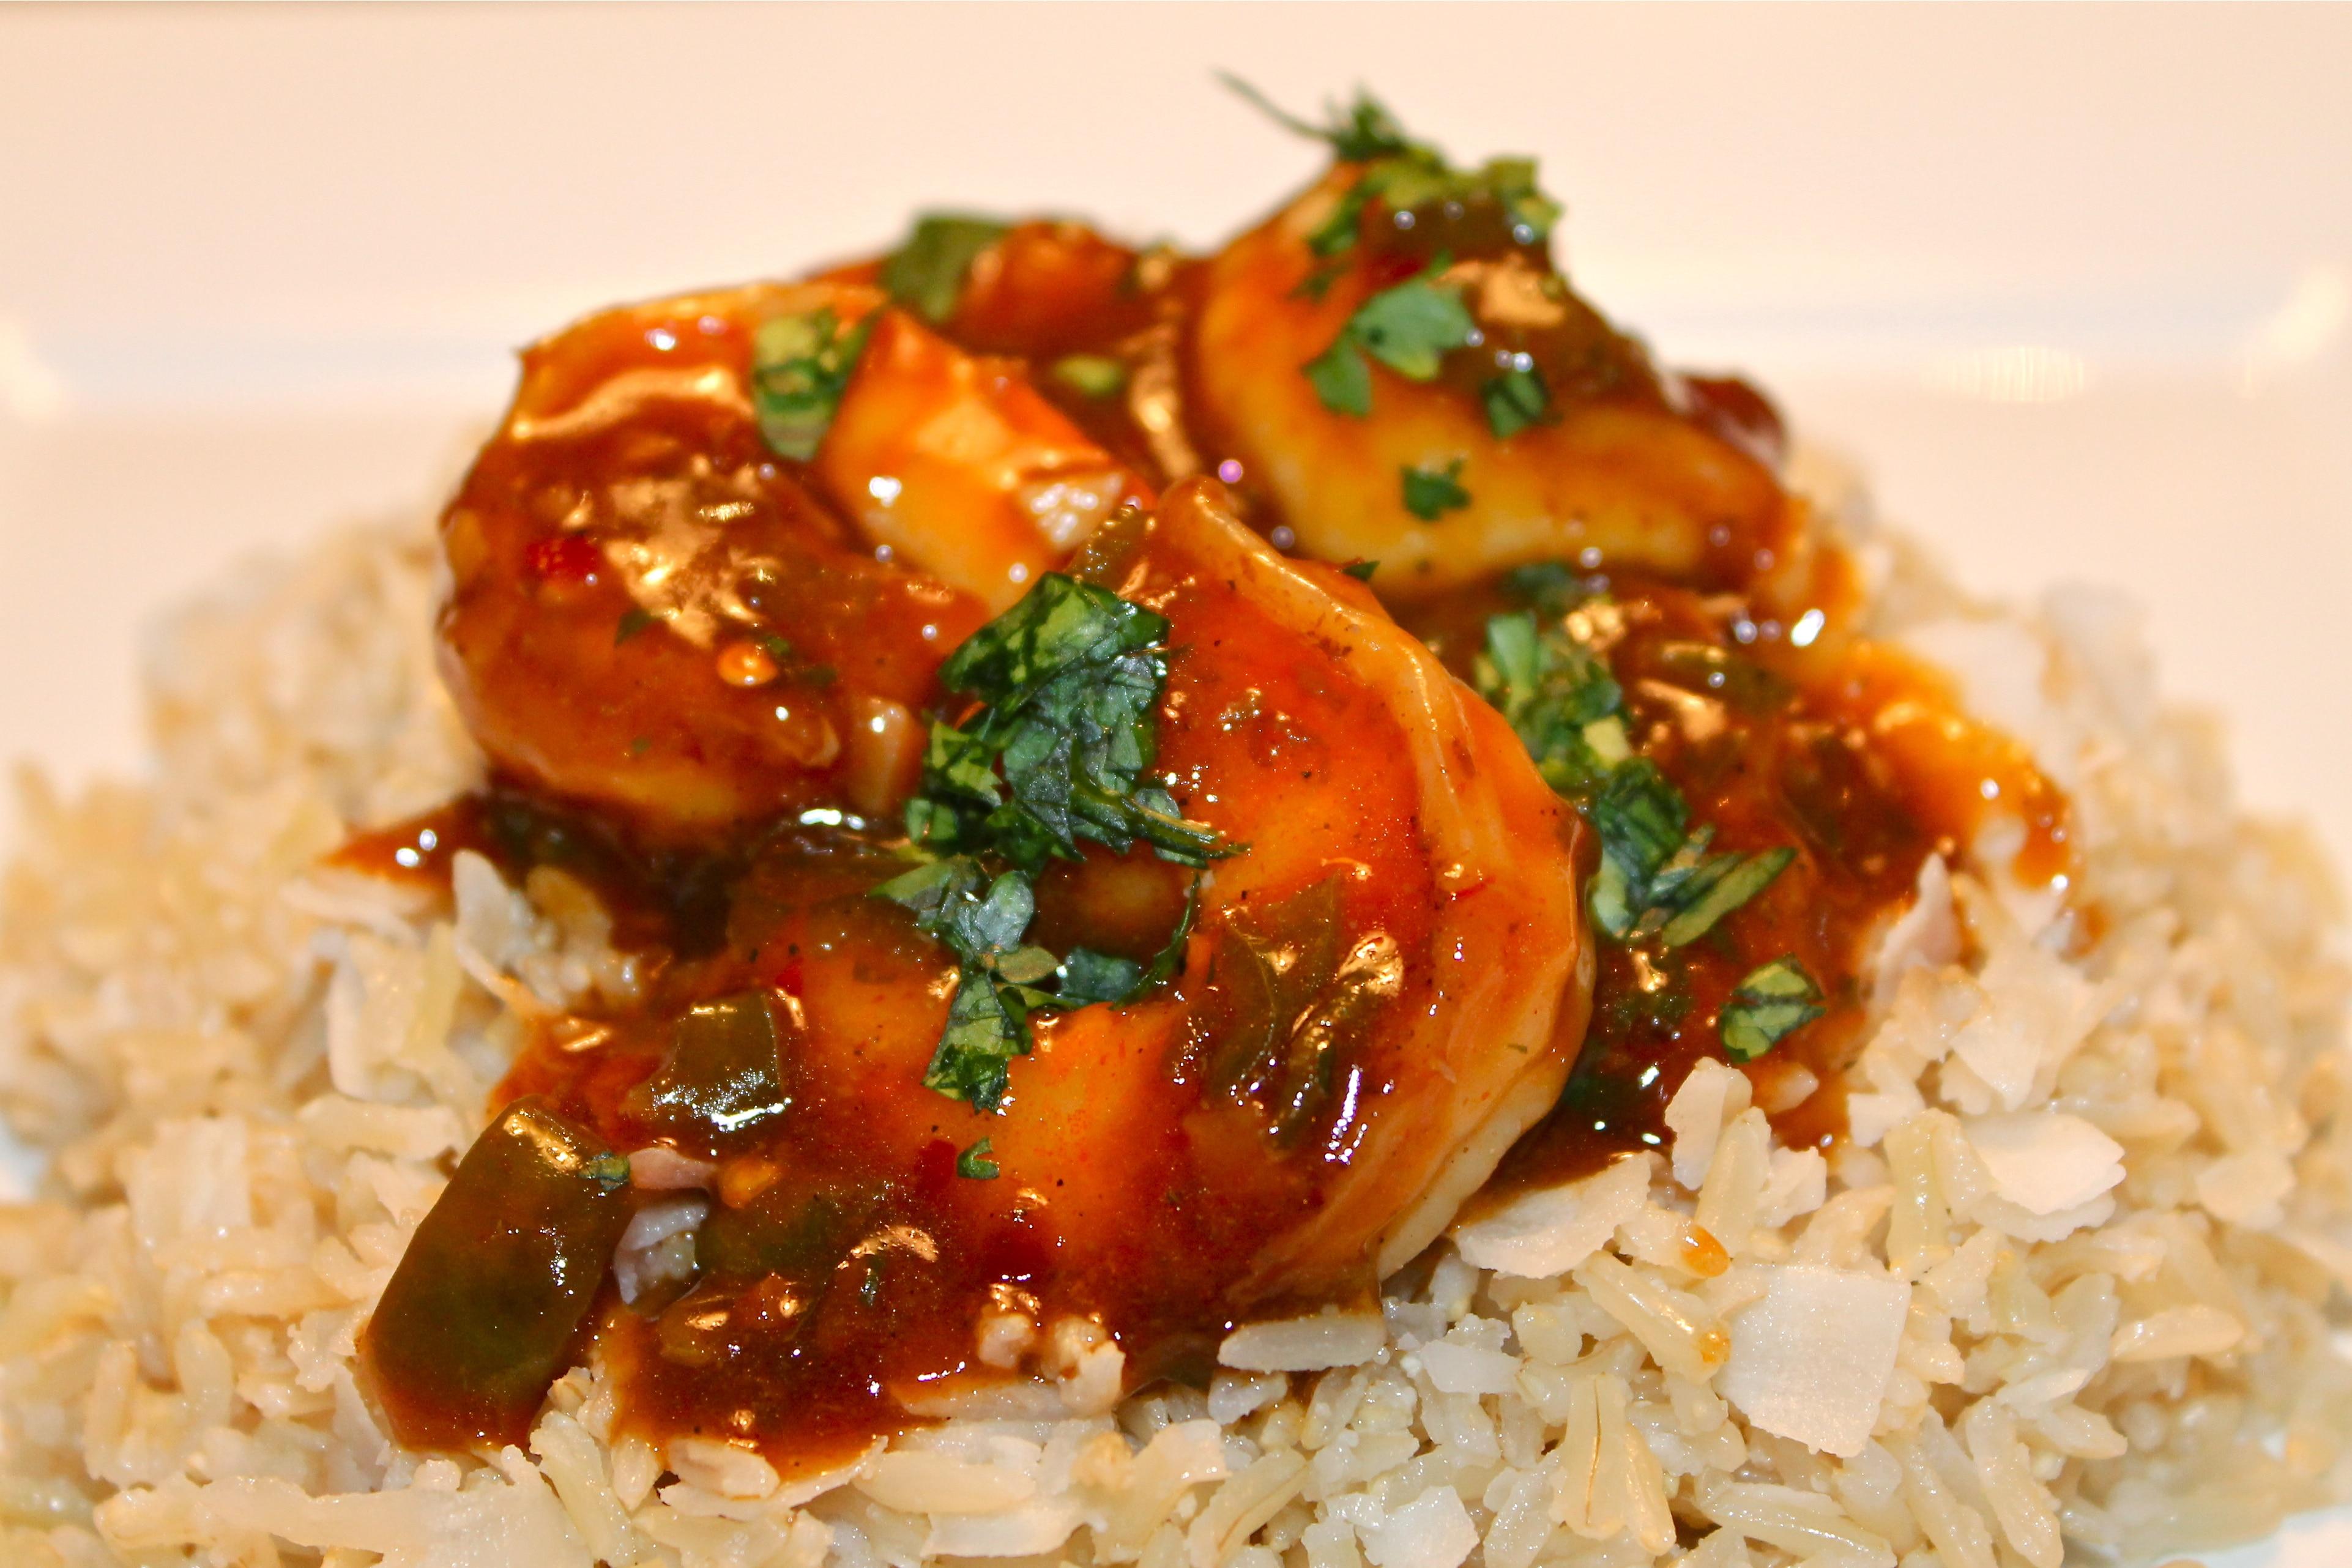 Chili Lime Garlic Shrimp with Coconut Brown Basmati Rice